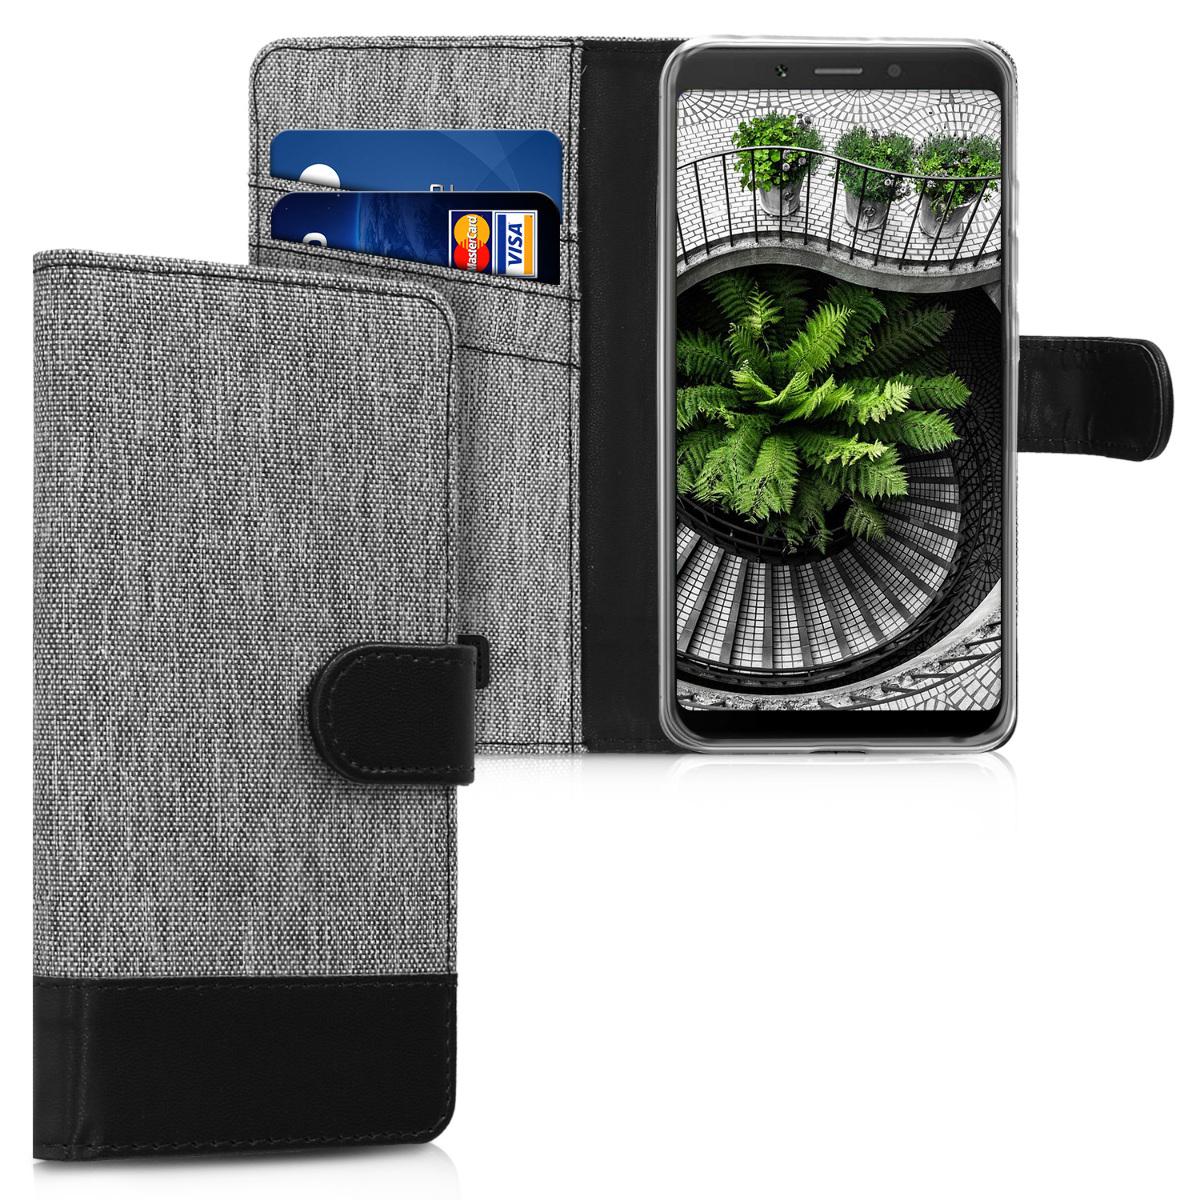 KW Θήκη - Πορτοφόλι Xiaomi Redmi 6 - Grey / Black (46137.22)